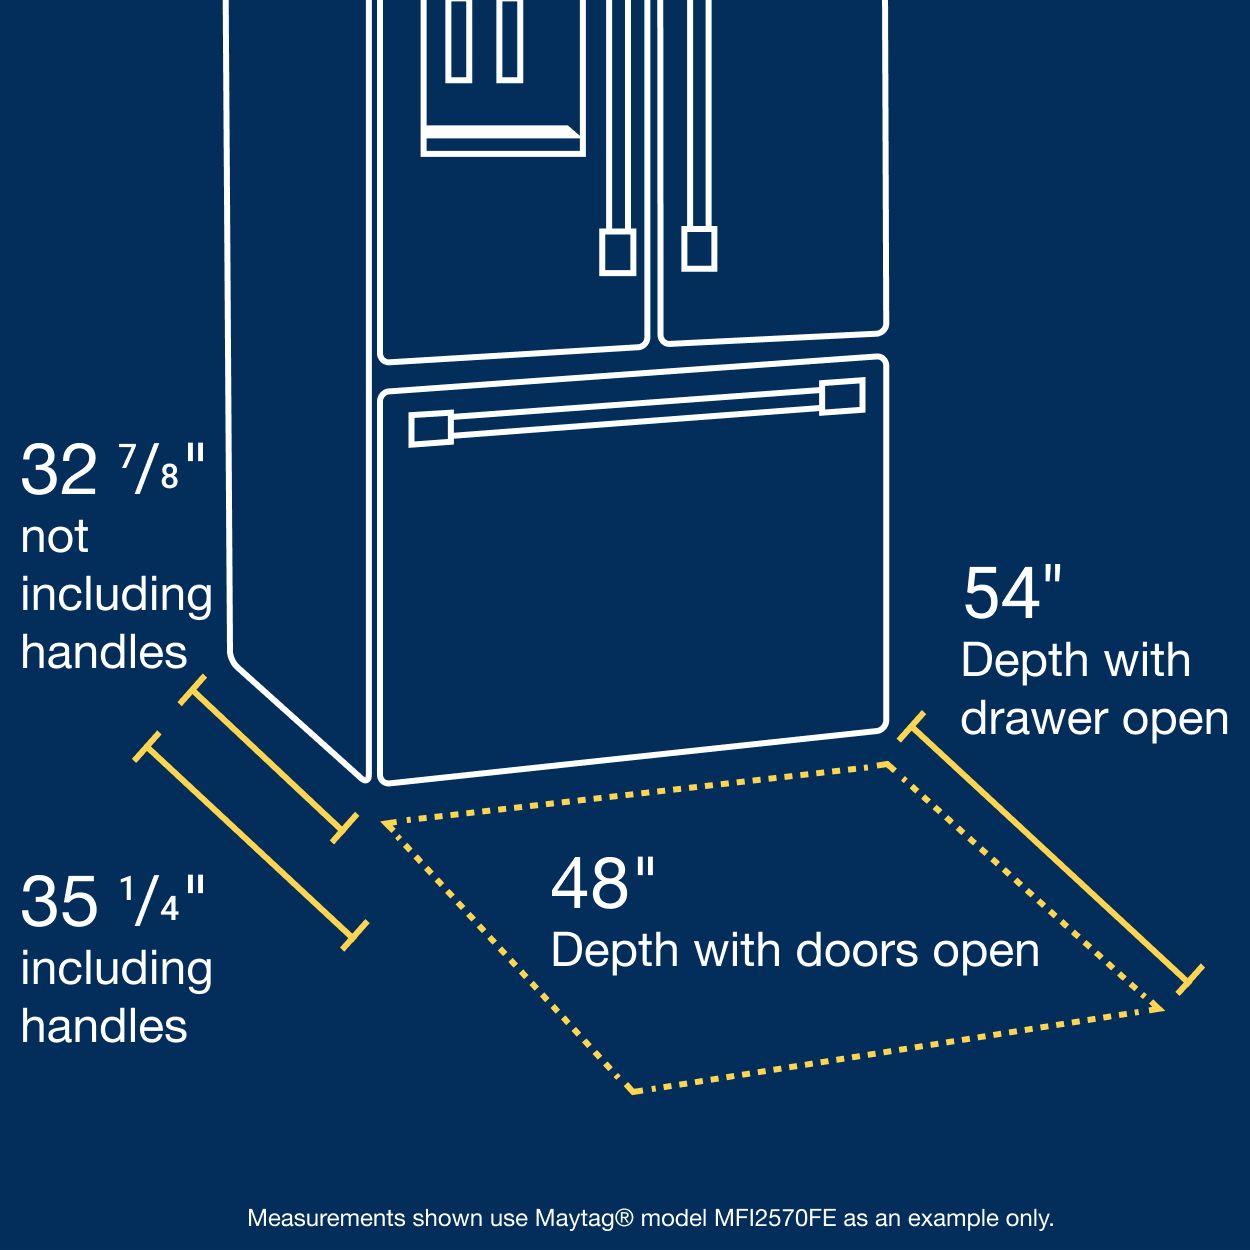 Refrigerator depth measurements